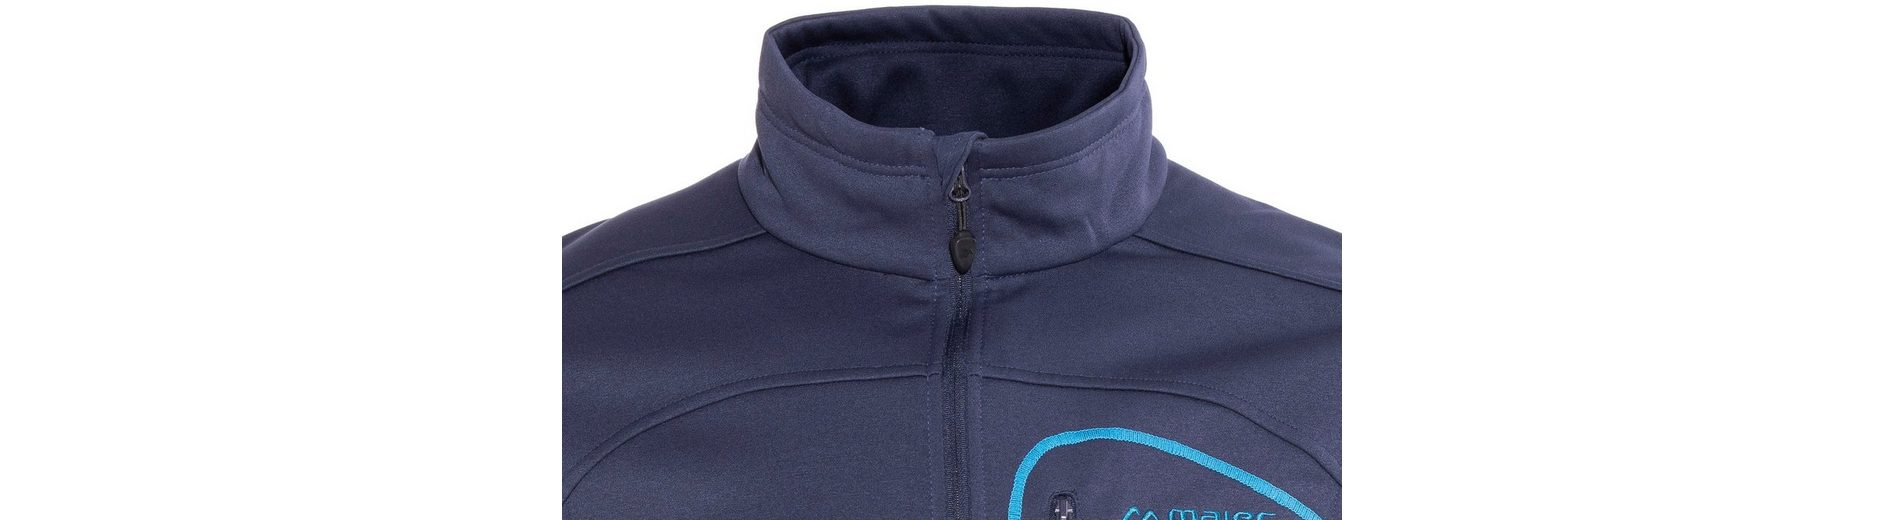 Maier Sports Outdoorjacke Tranby Fleece Jacket Men Rabatt Empfehlen Gut Verkaufen Zu Verkaufen nsUAaE